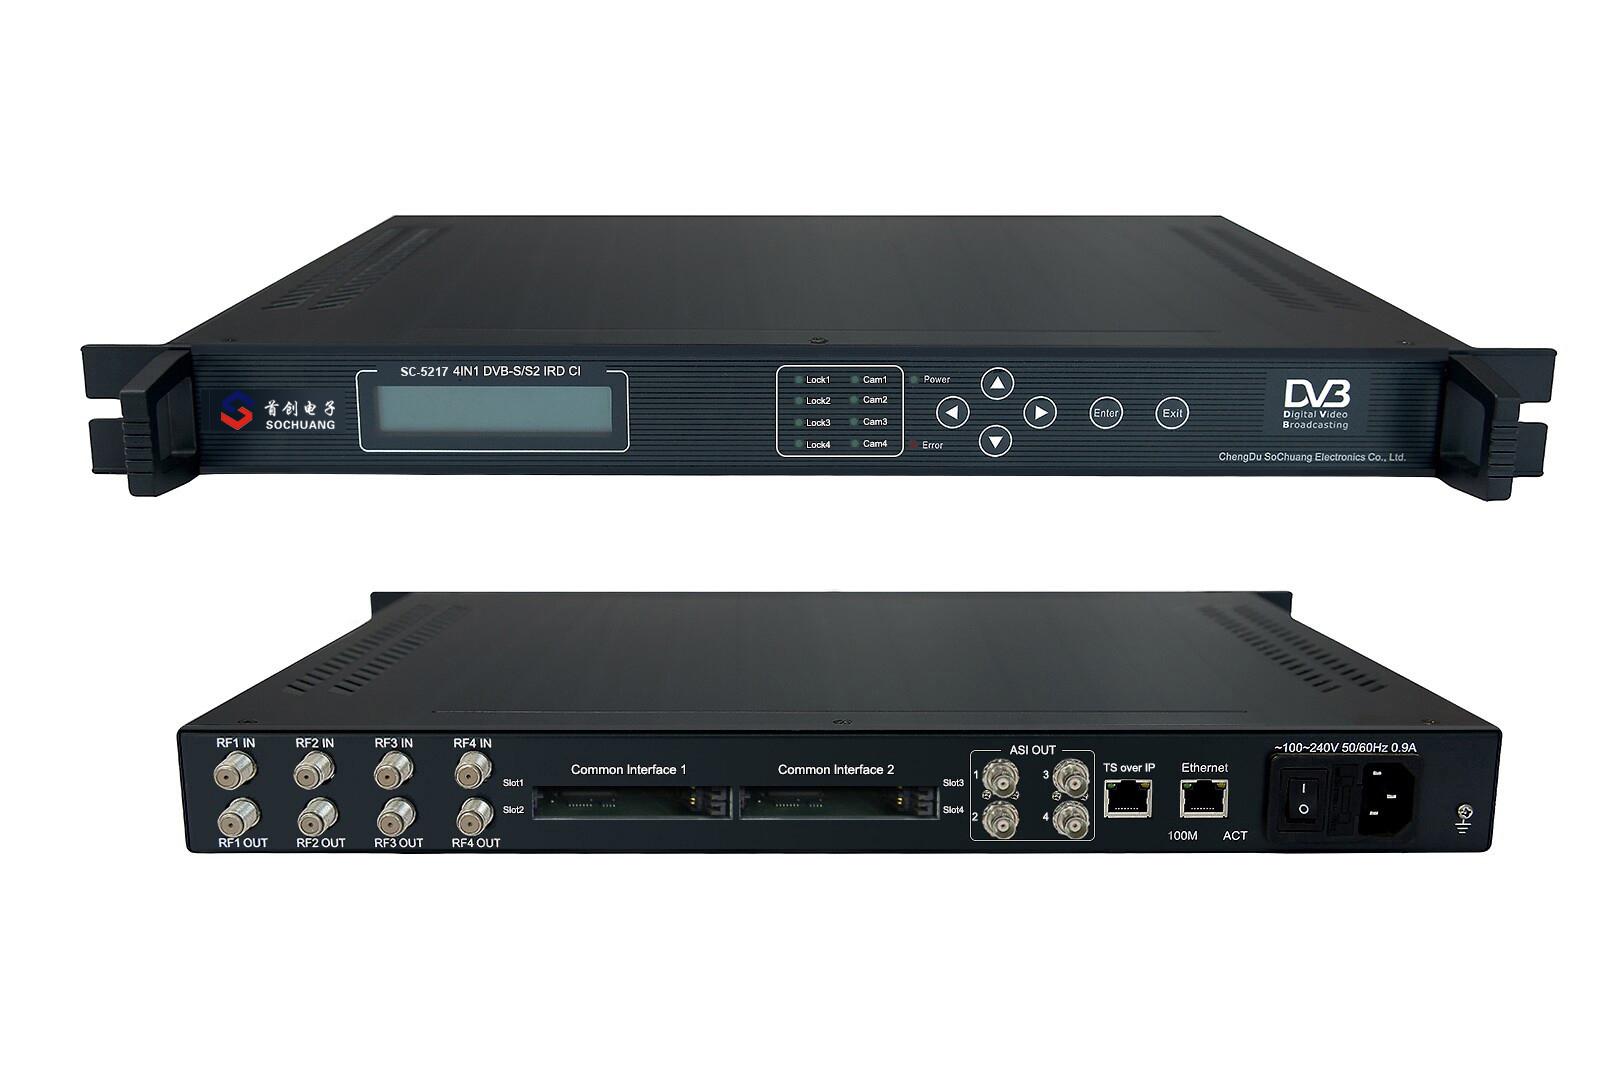 SC-5117 4in1 DVB-C CI IP IRD